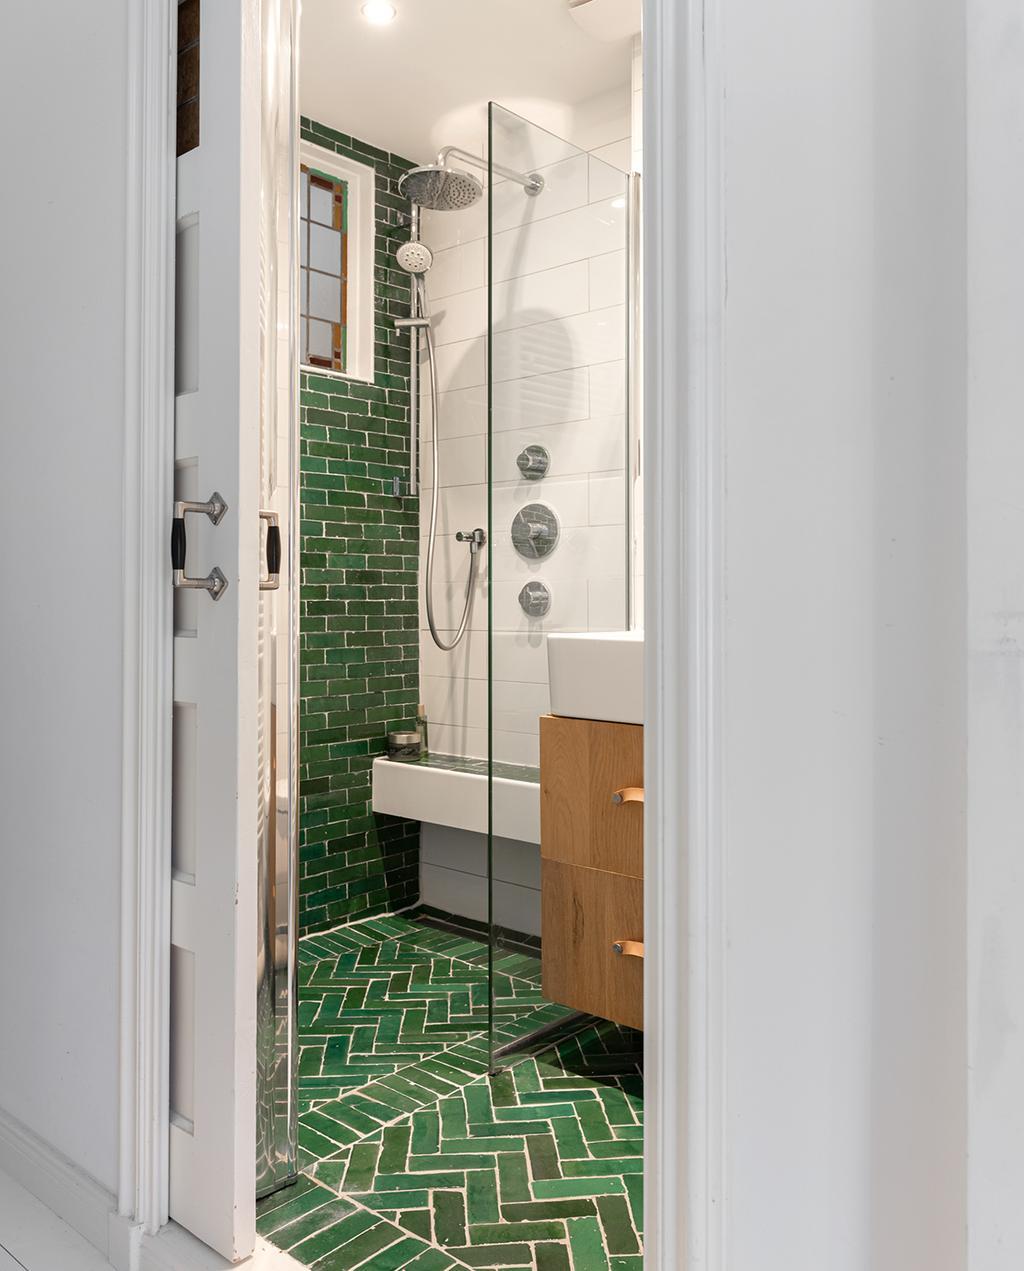 vtwonen special tiny houses | badkamer met groene chevron tegels